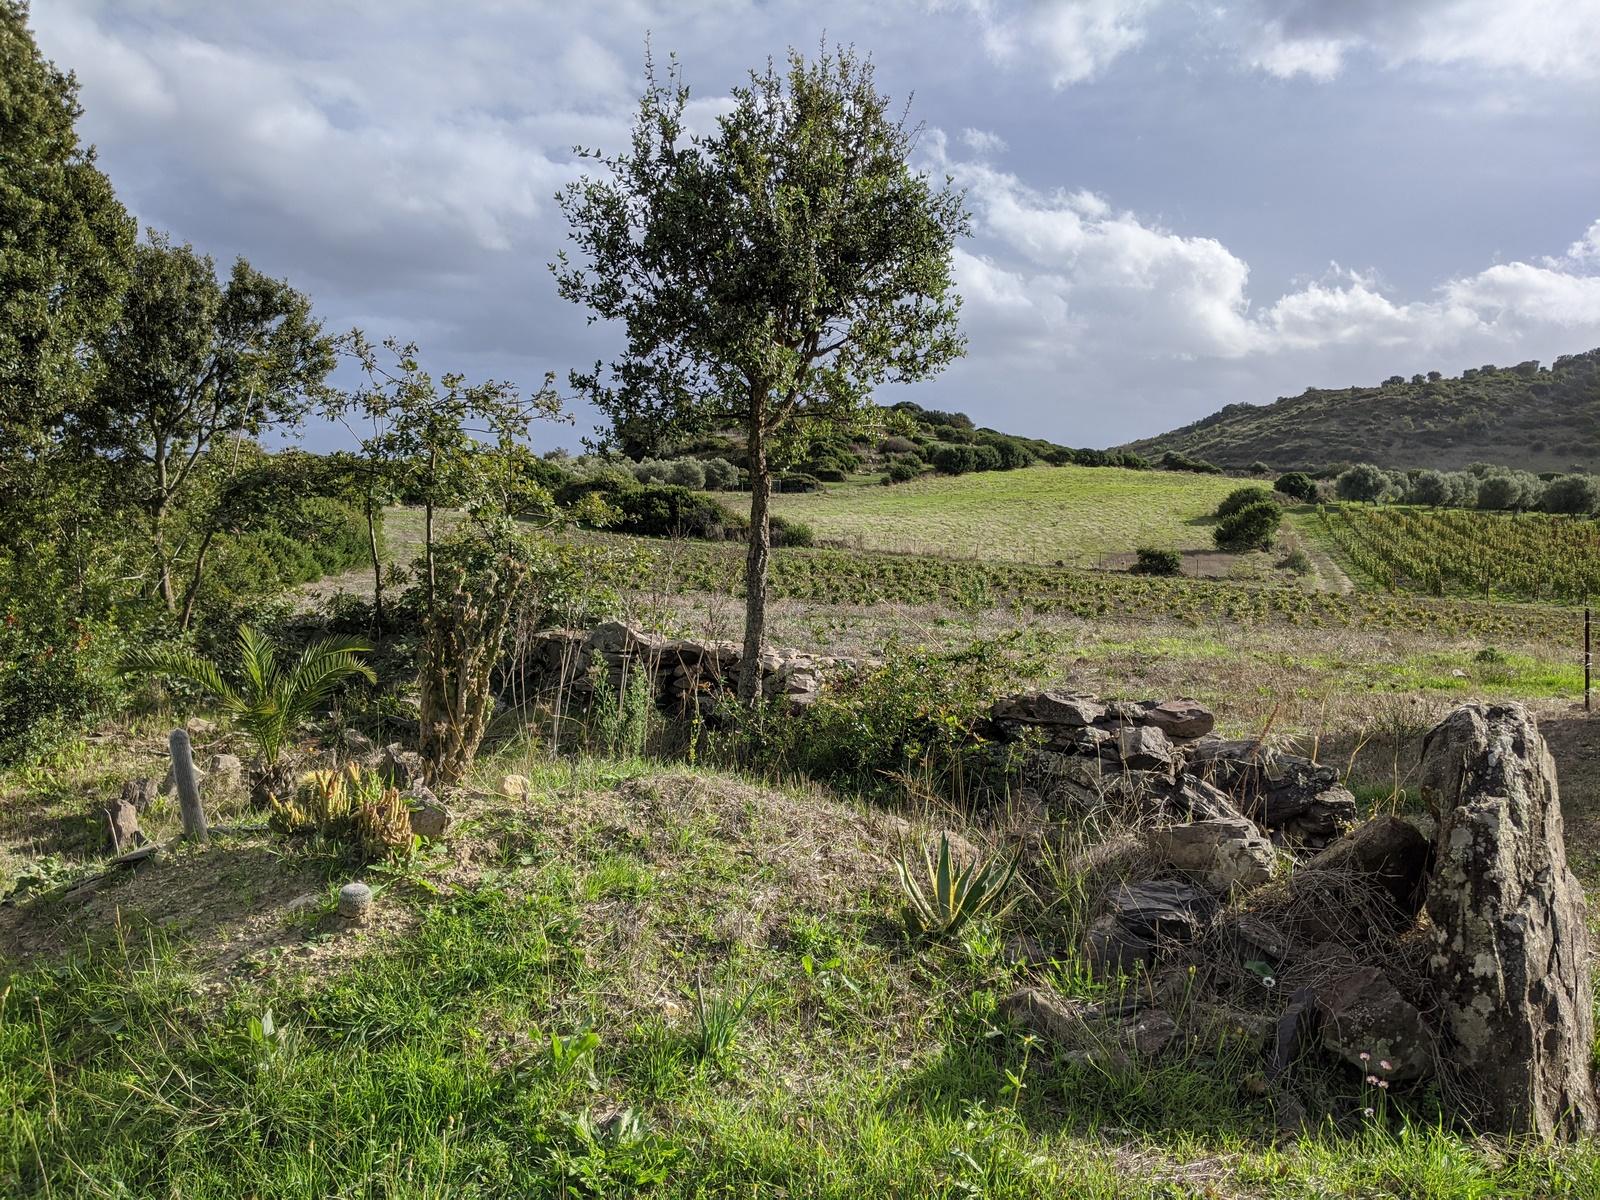 Pedra Niedda Tenute - vignoble en Sardaigne